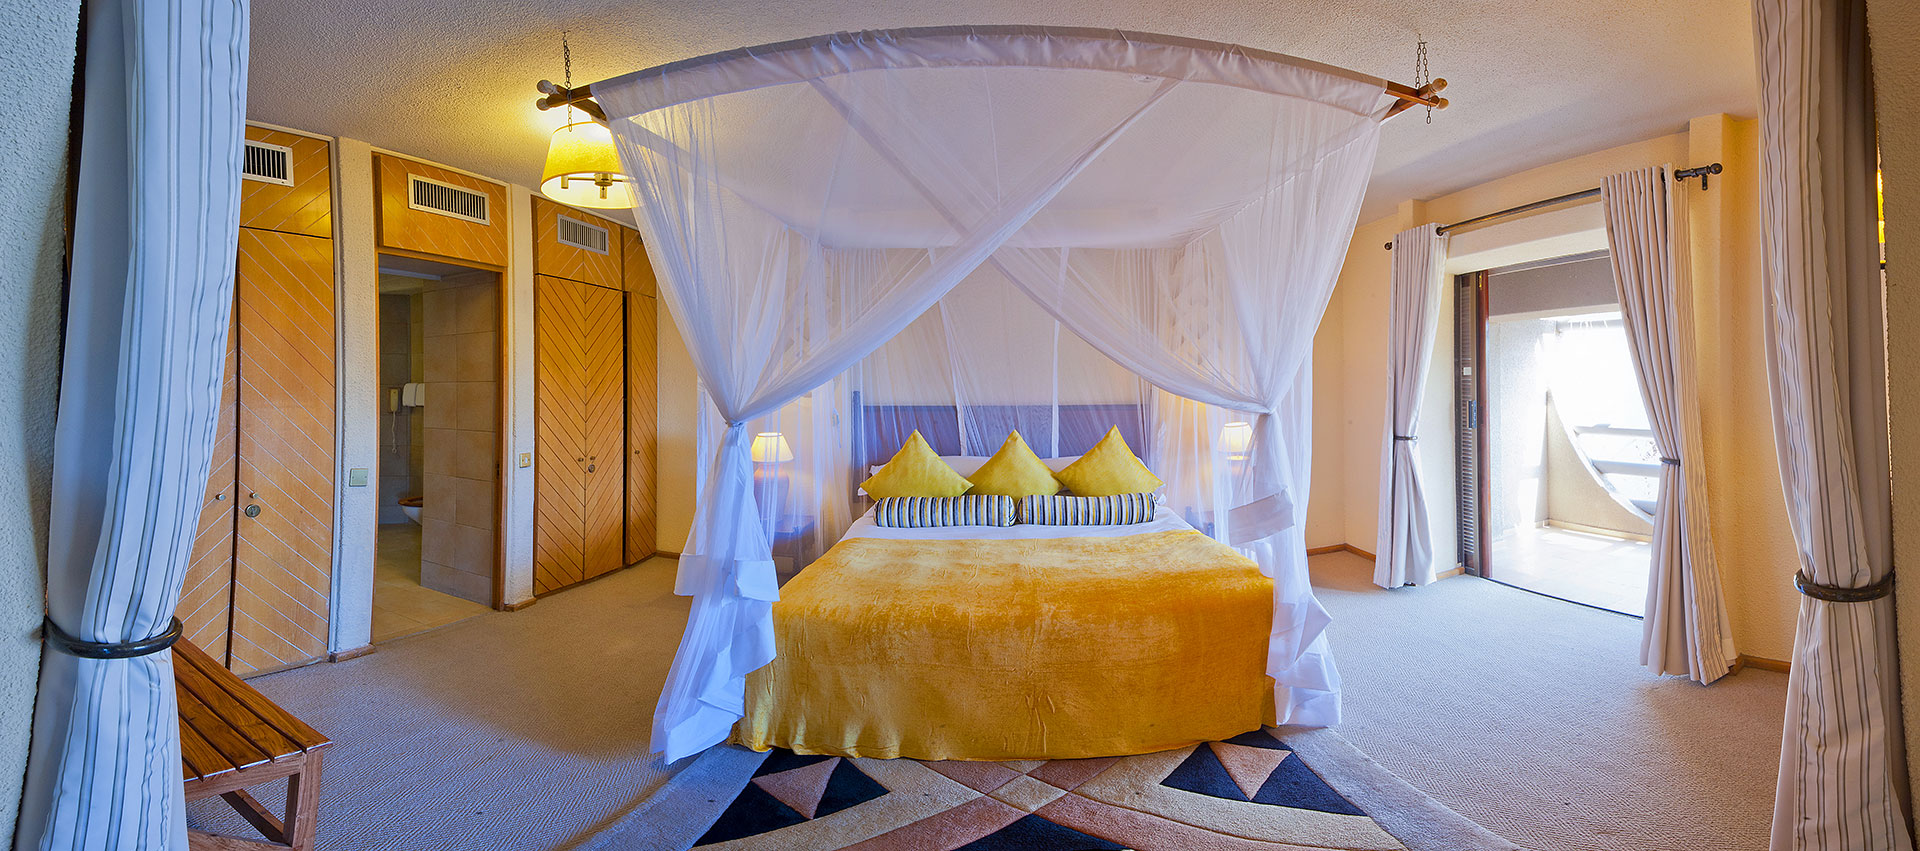 5 Star Hotel Five Resort Stars Dlw Luxury Hotels Worldwide Official Website